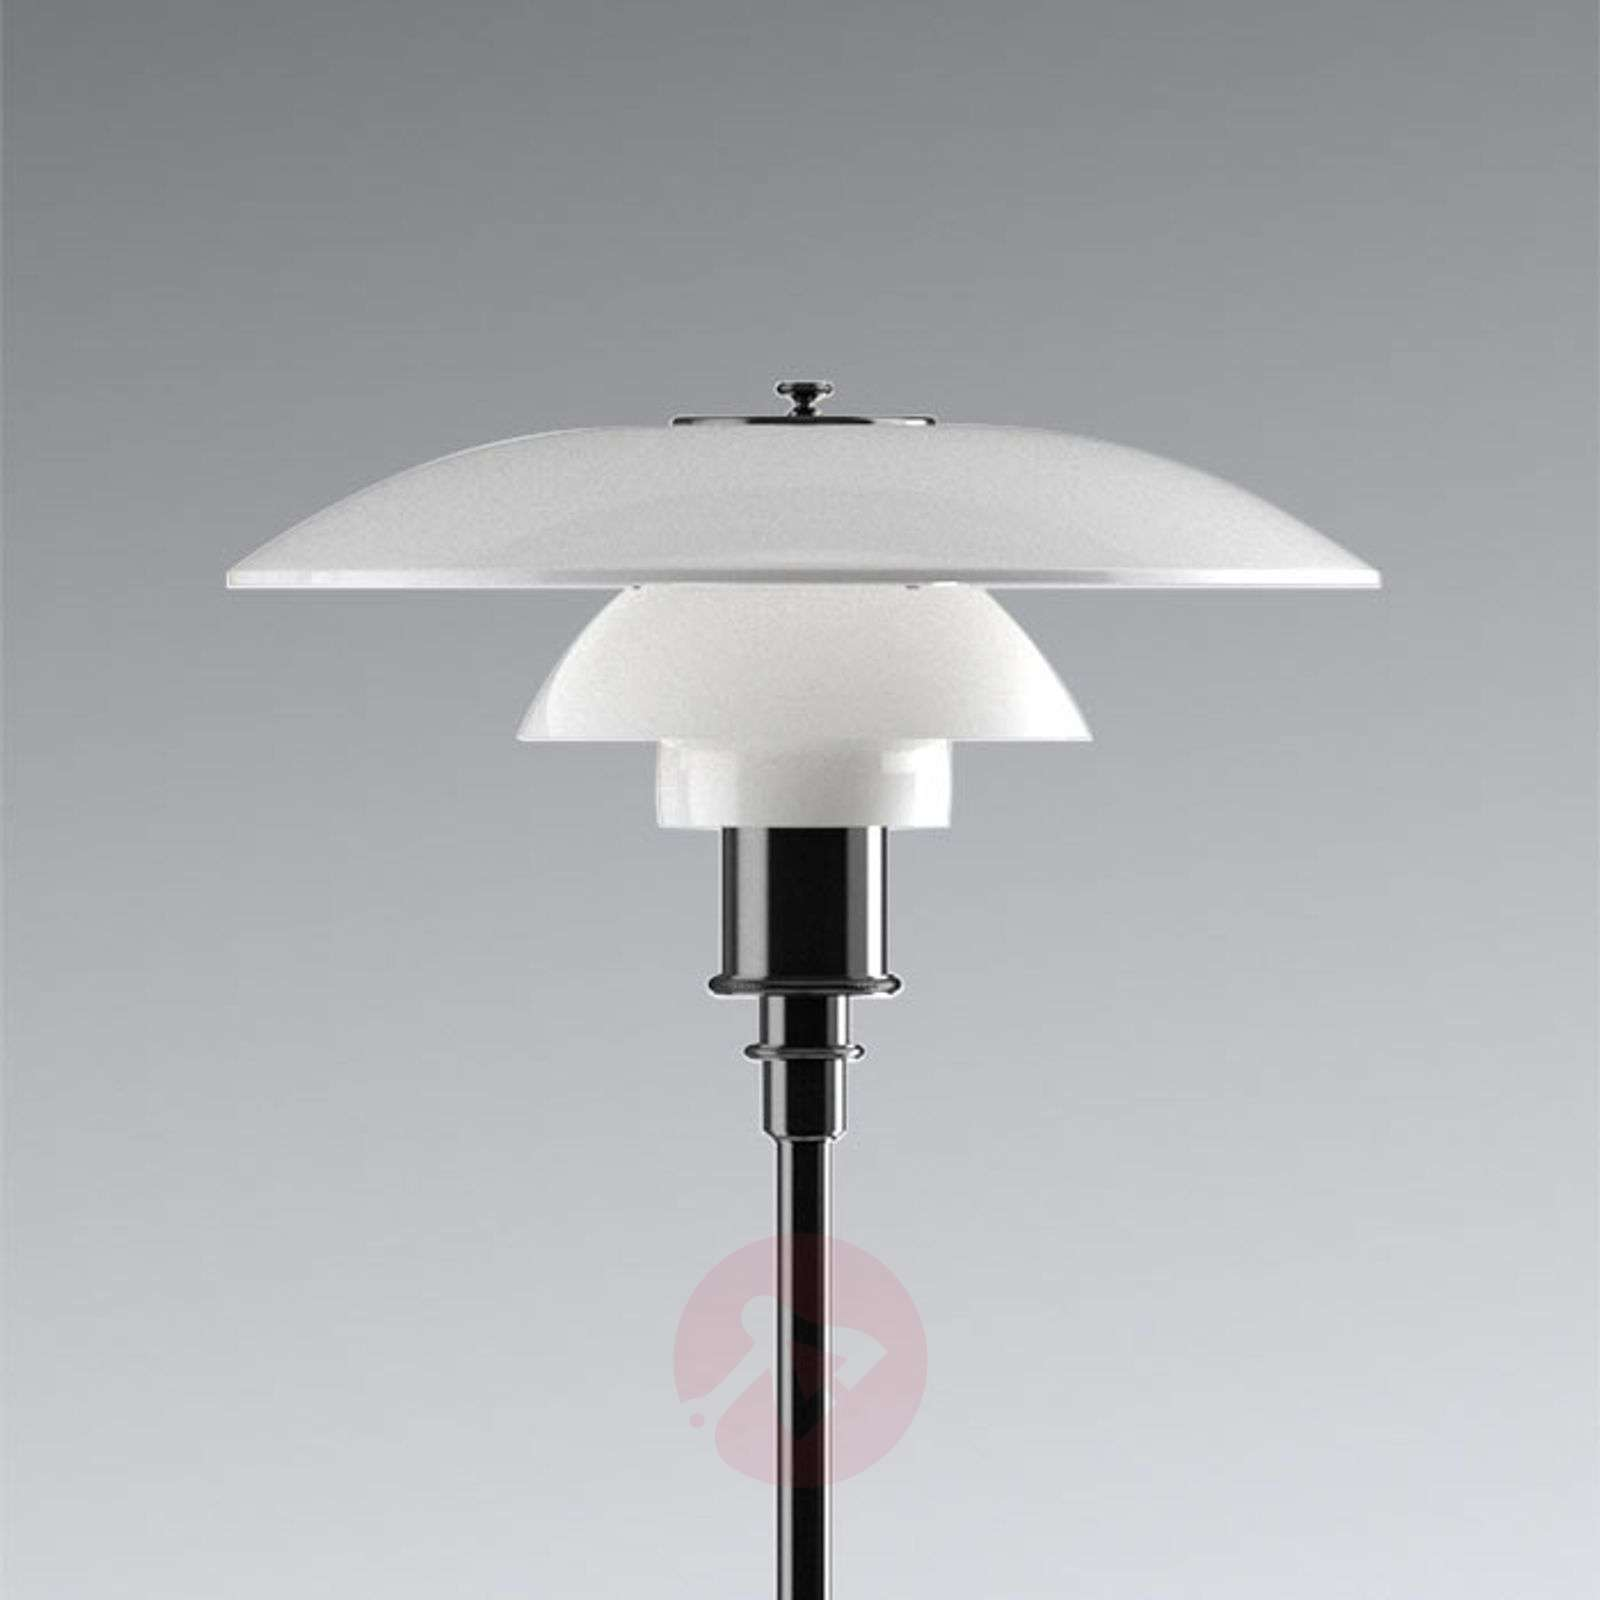 Louis Poulsen PH 3 1/2-2 1/2 floor lamp-6090106X-01